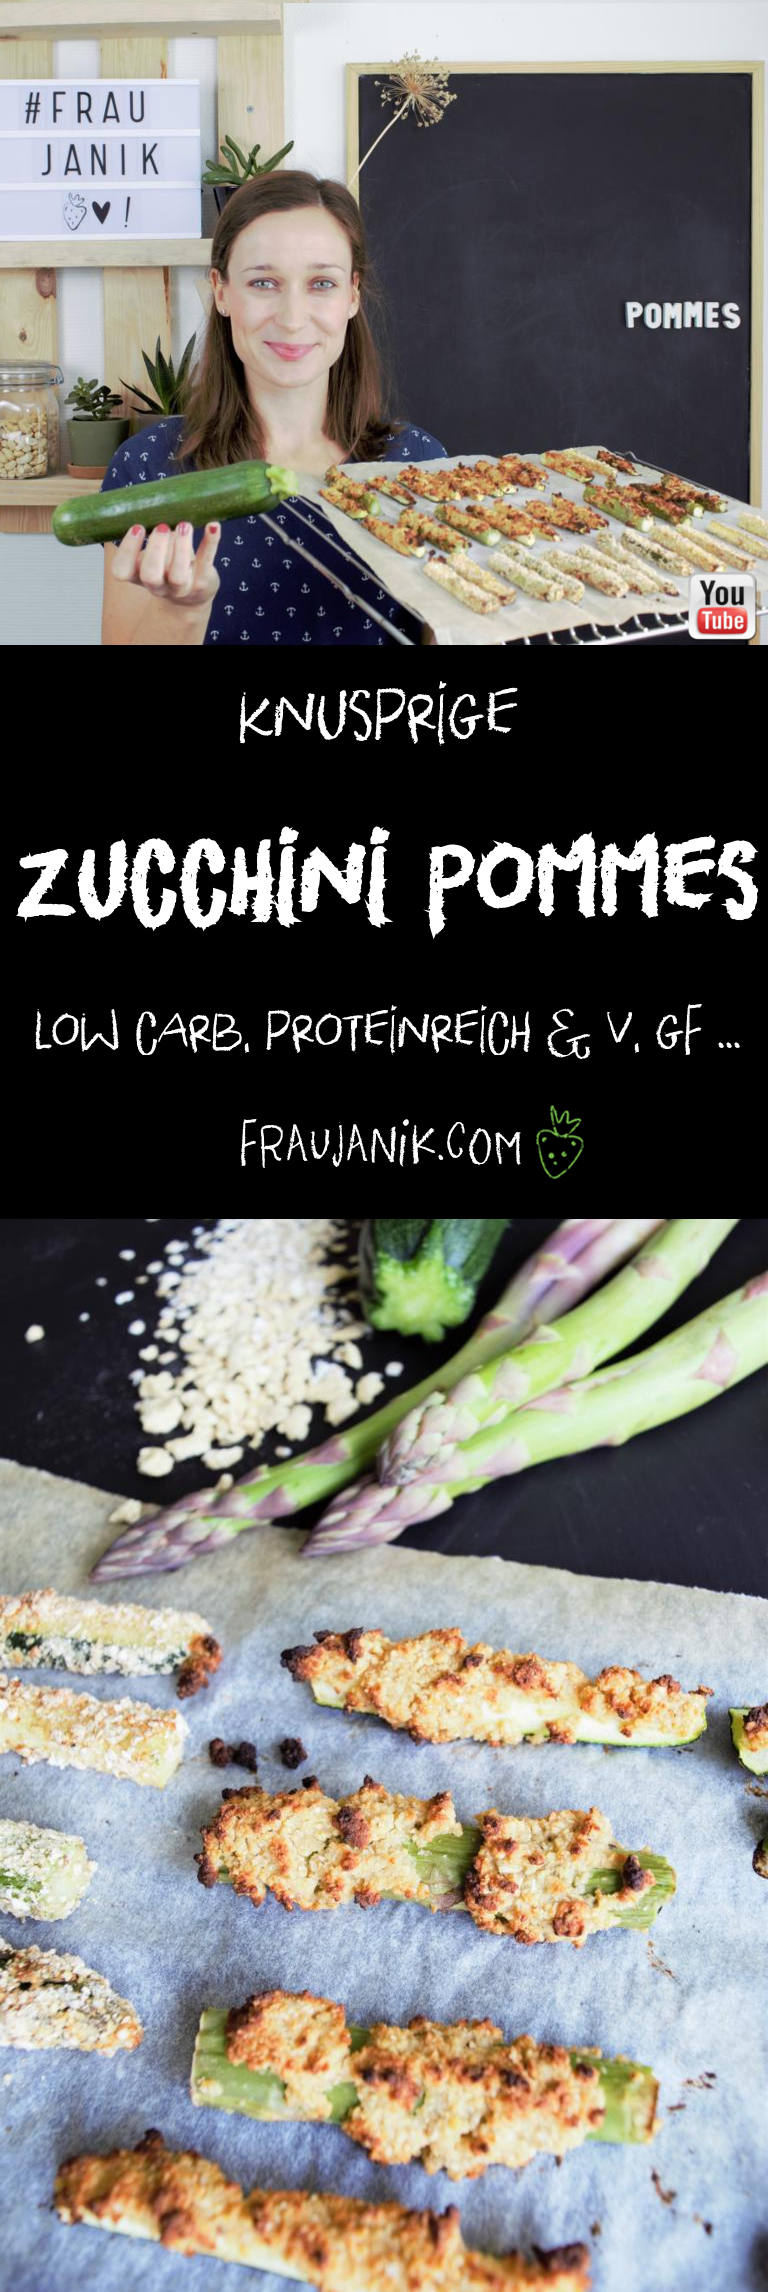 knusprige zucchini Pommes vegan